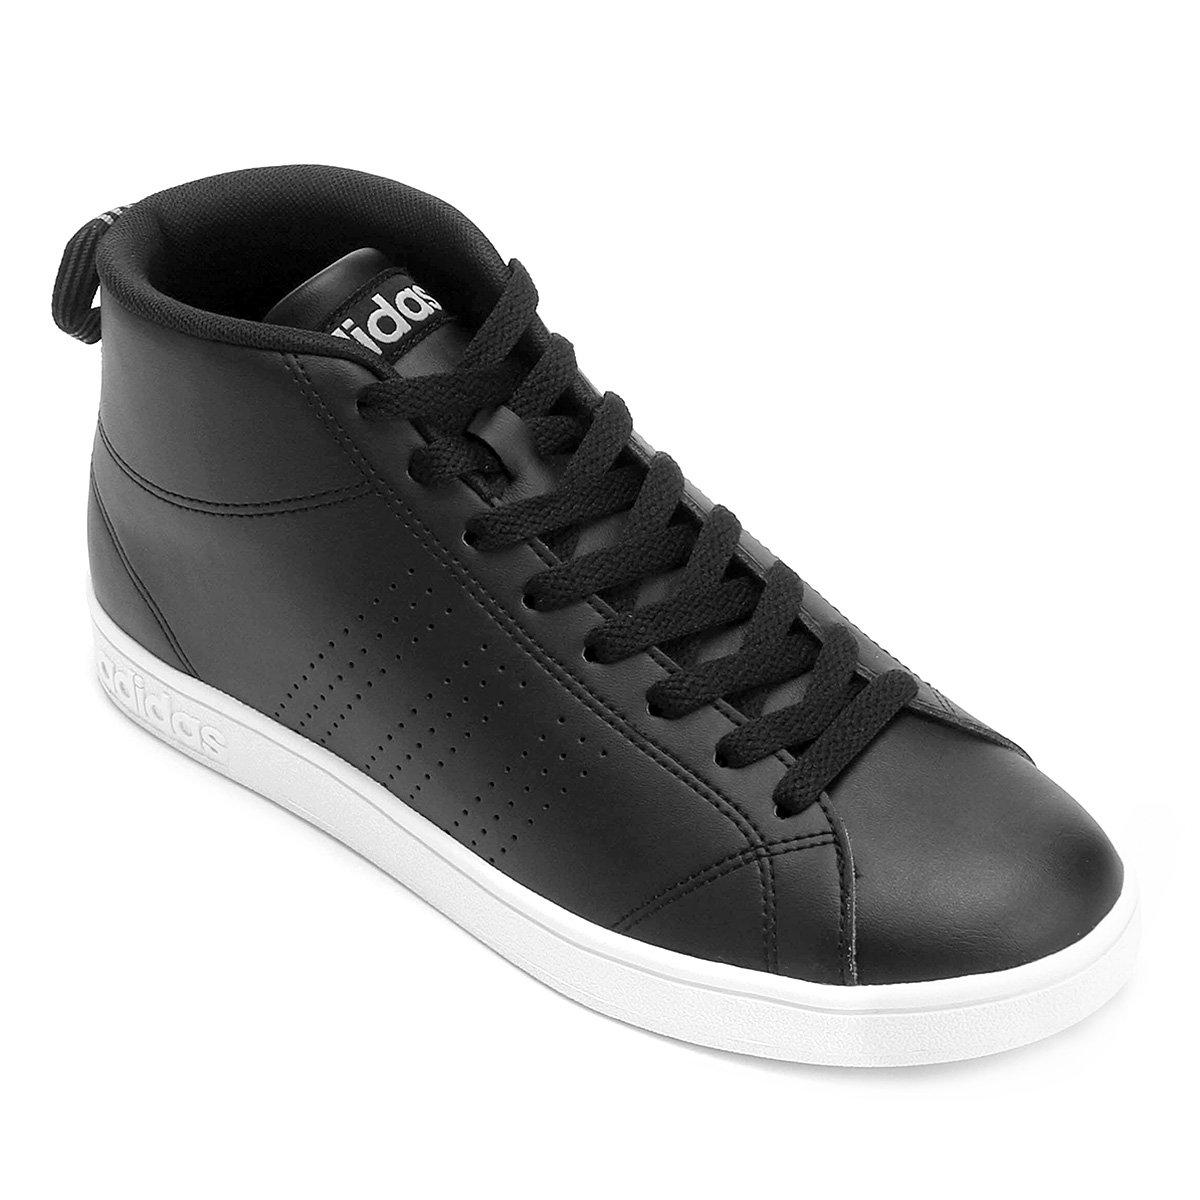 Tênis Adidas Advantage Clean Mid Masculino - Compre Agora  59d981df75c40